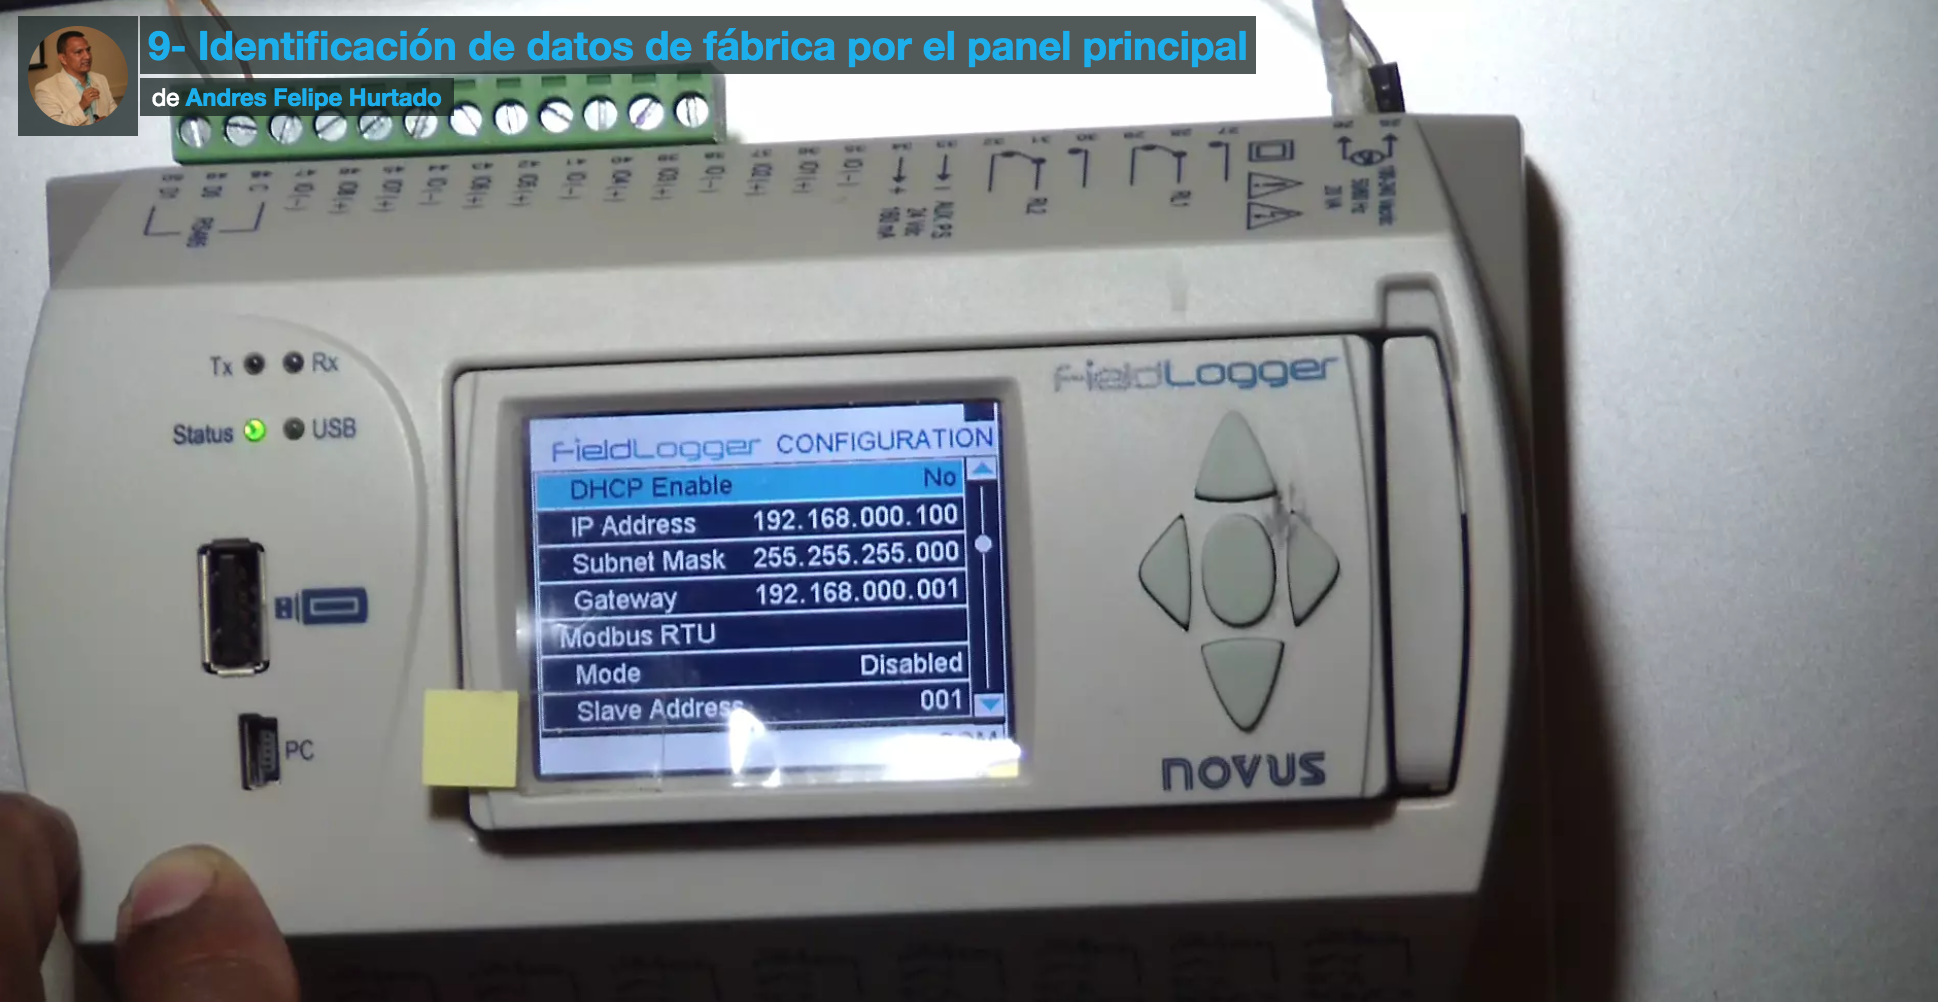 Curso de Filedlogger-revisión de datos de fábrica por panel frontal